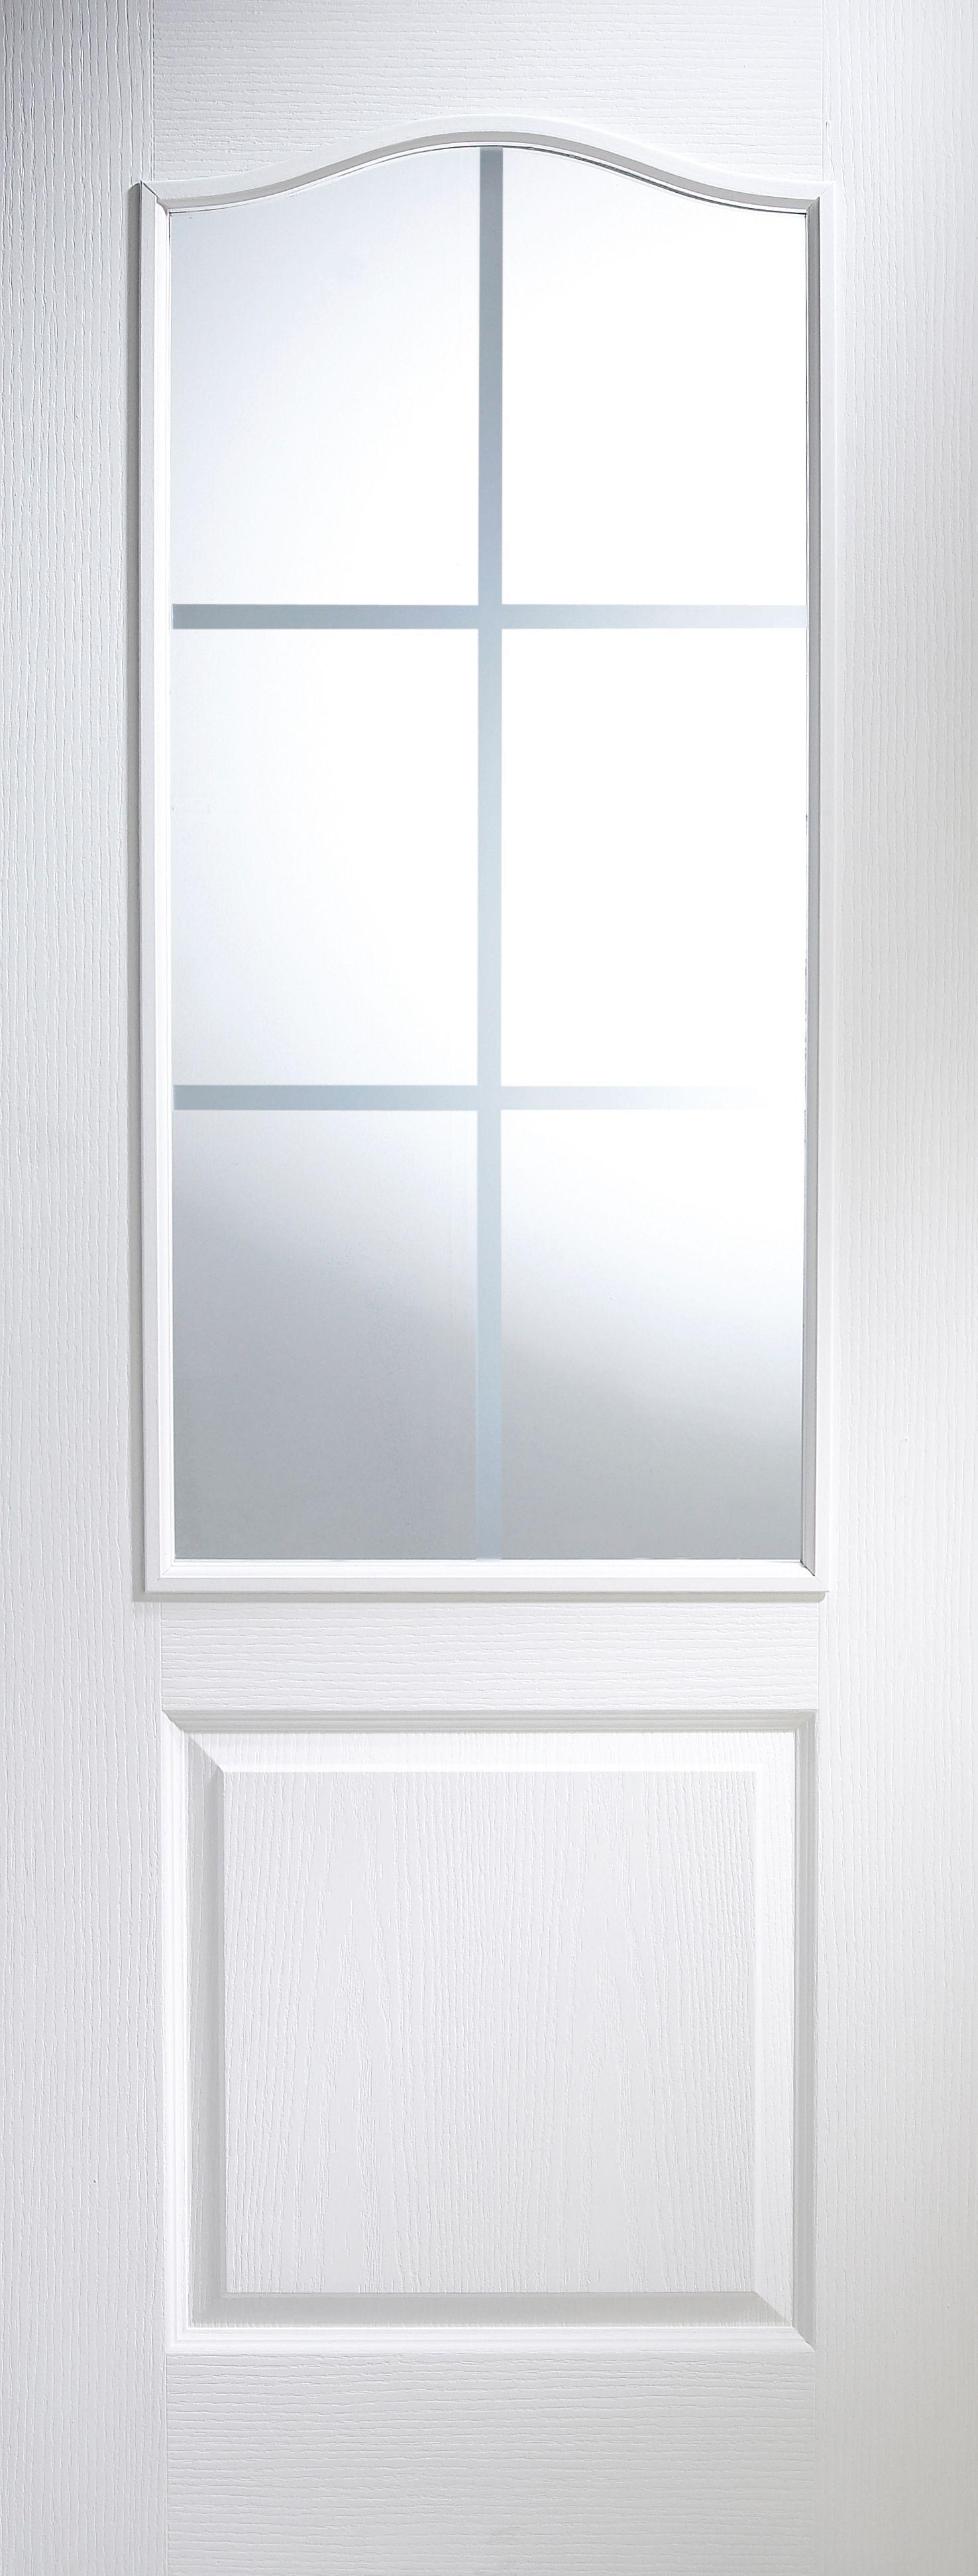 2 panel arched pre painted white woodgrain glazed internal. Black Bedroom Furniture Sets. Home Design Ideas